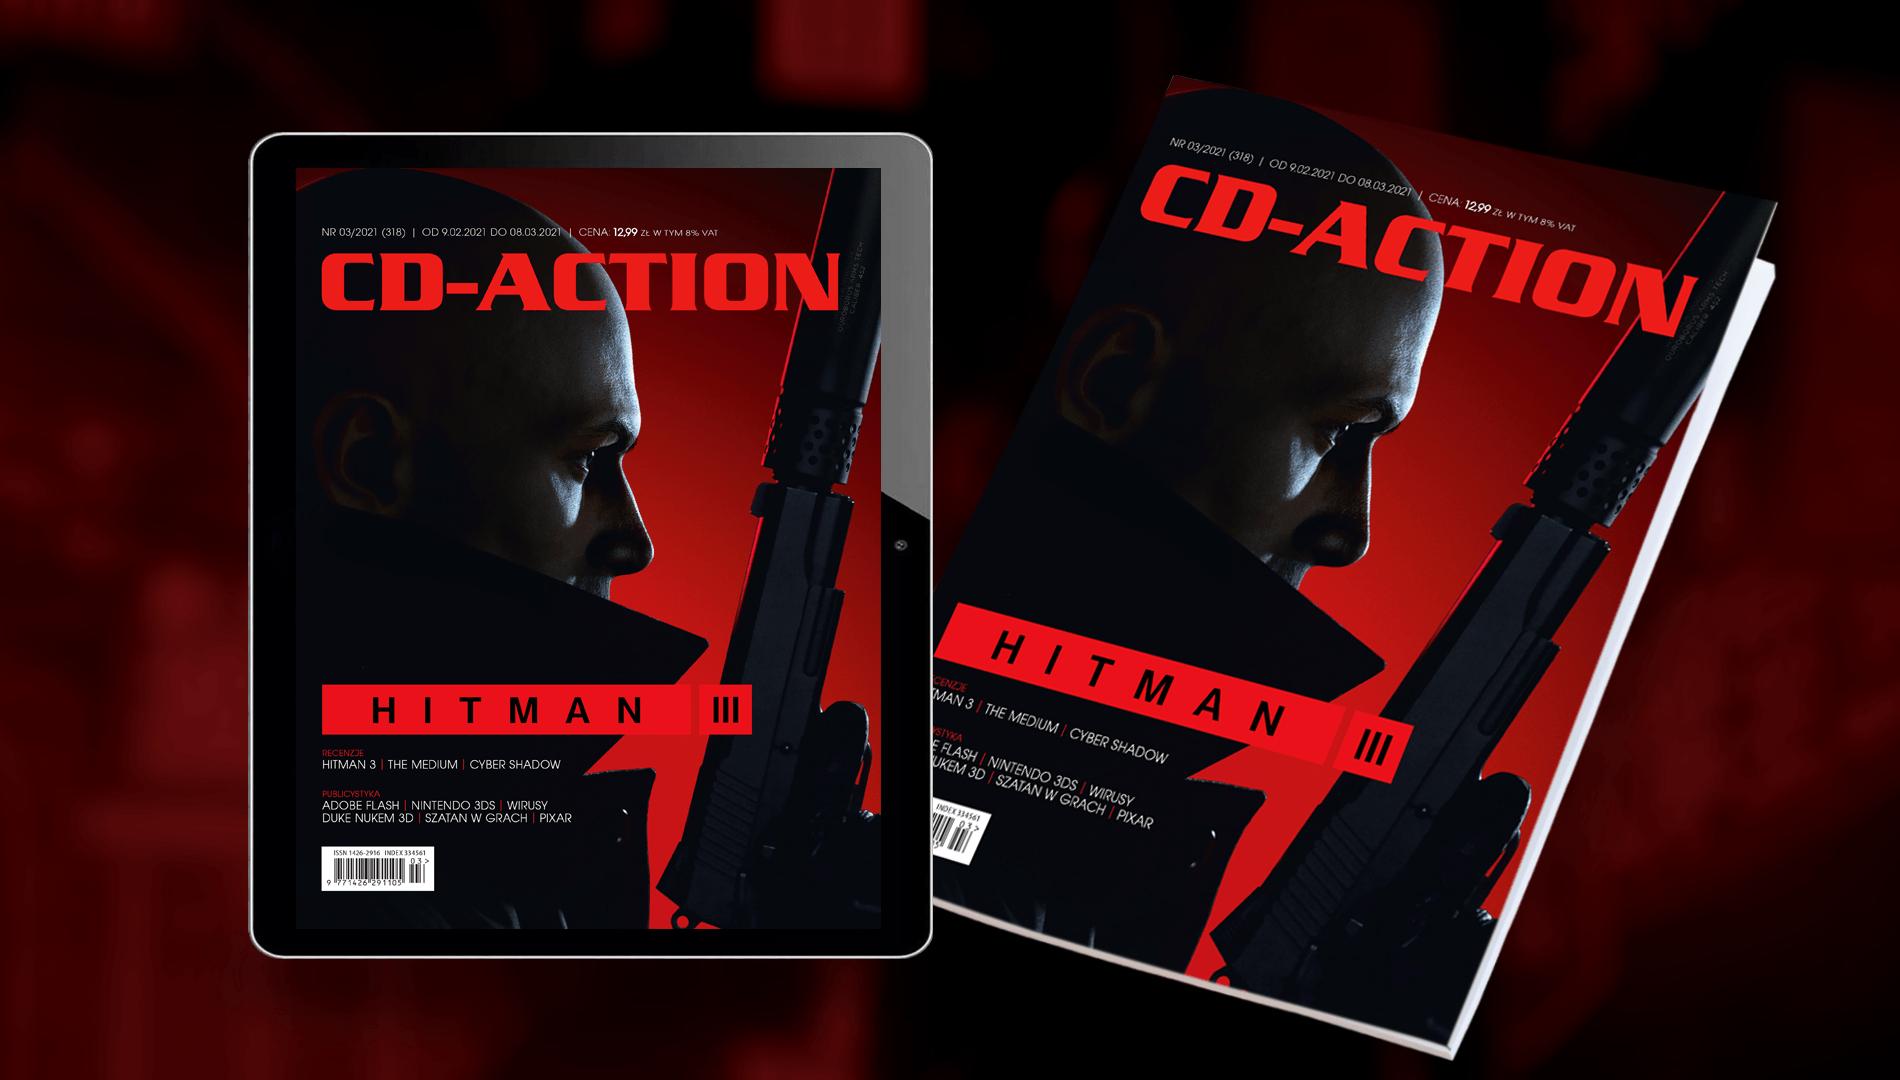 CD-ACTION za darmo 03/2021